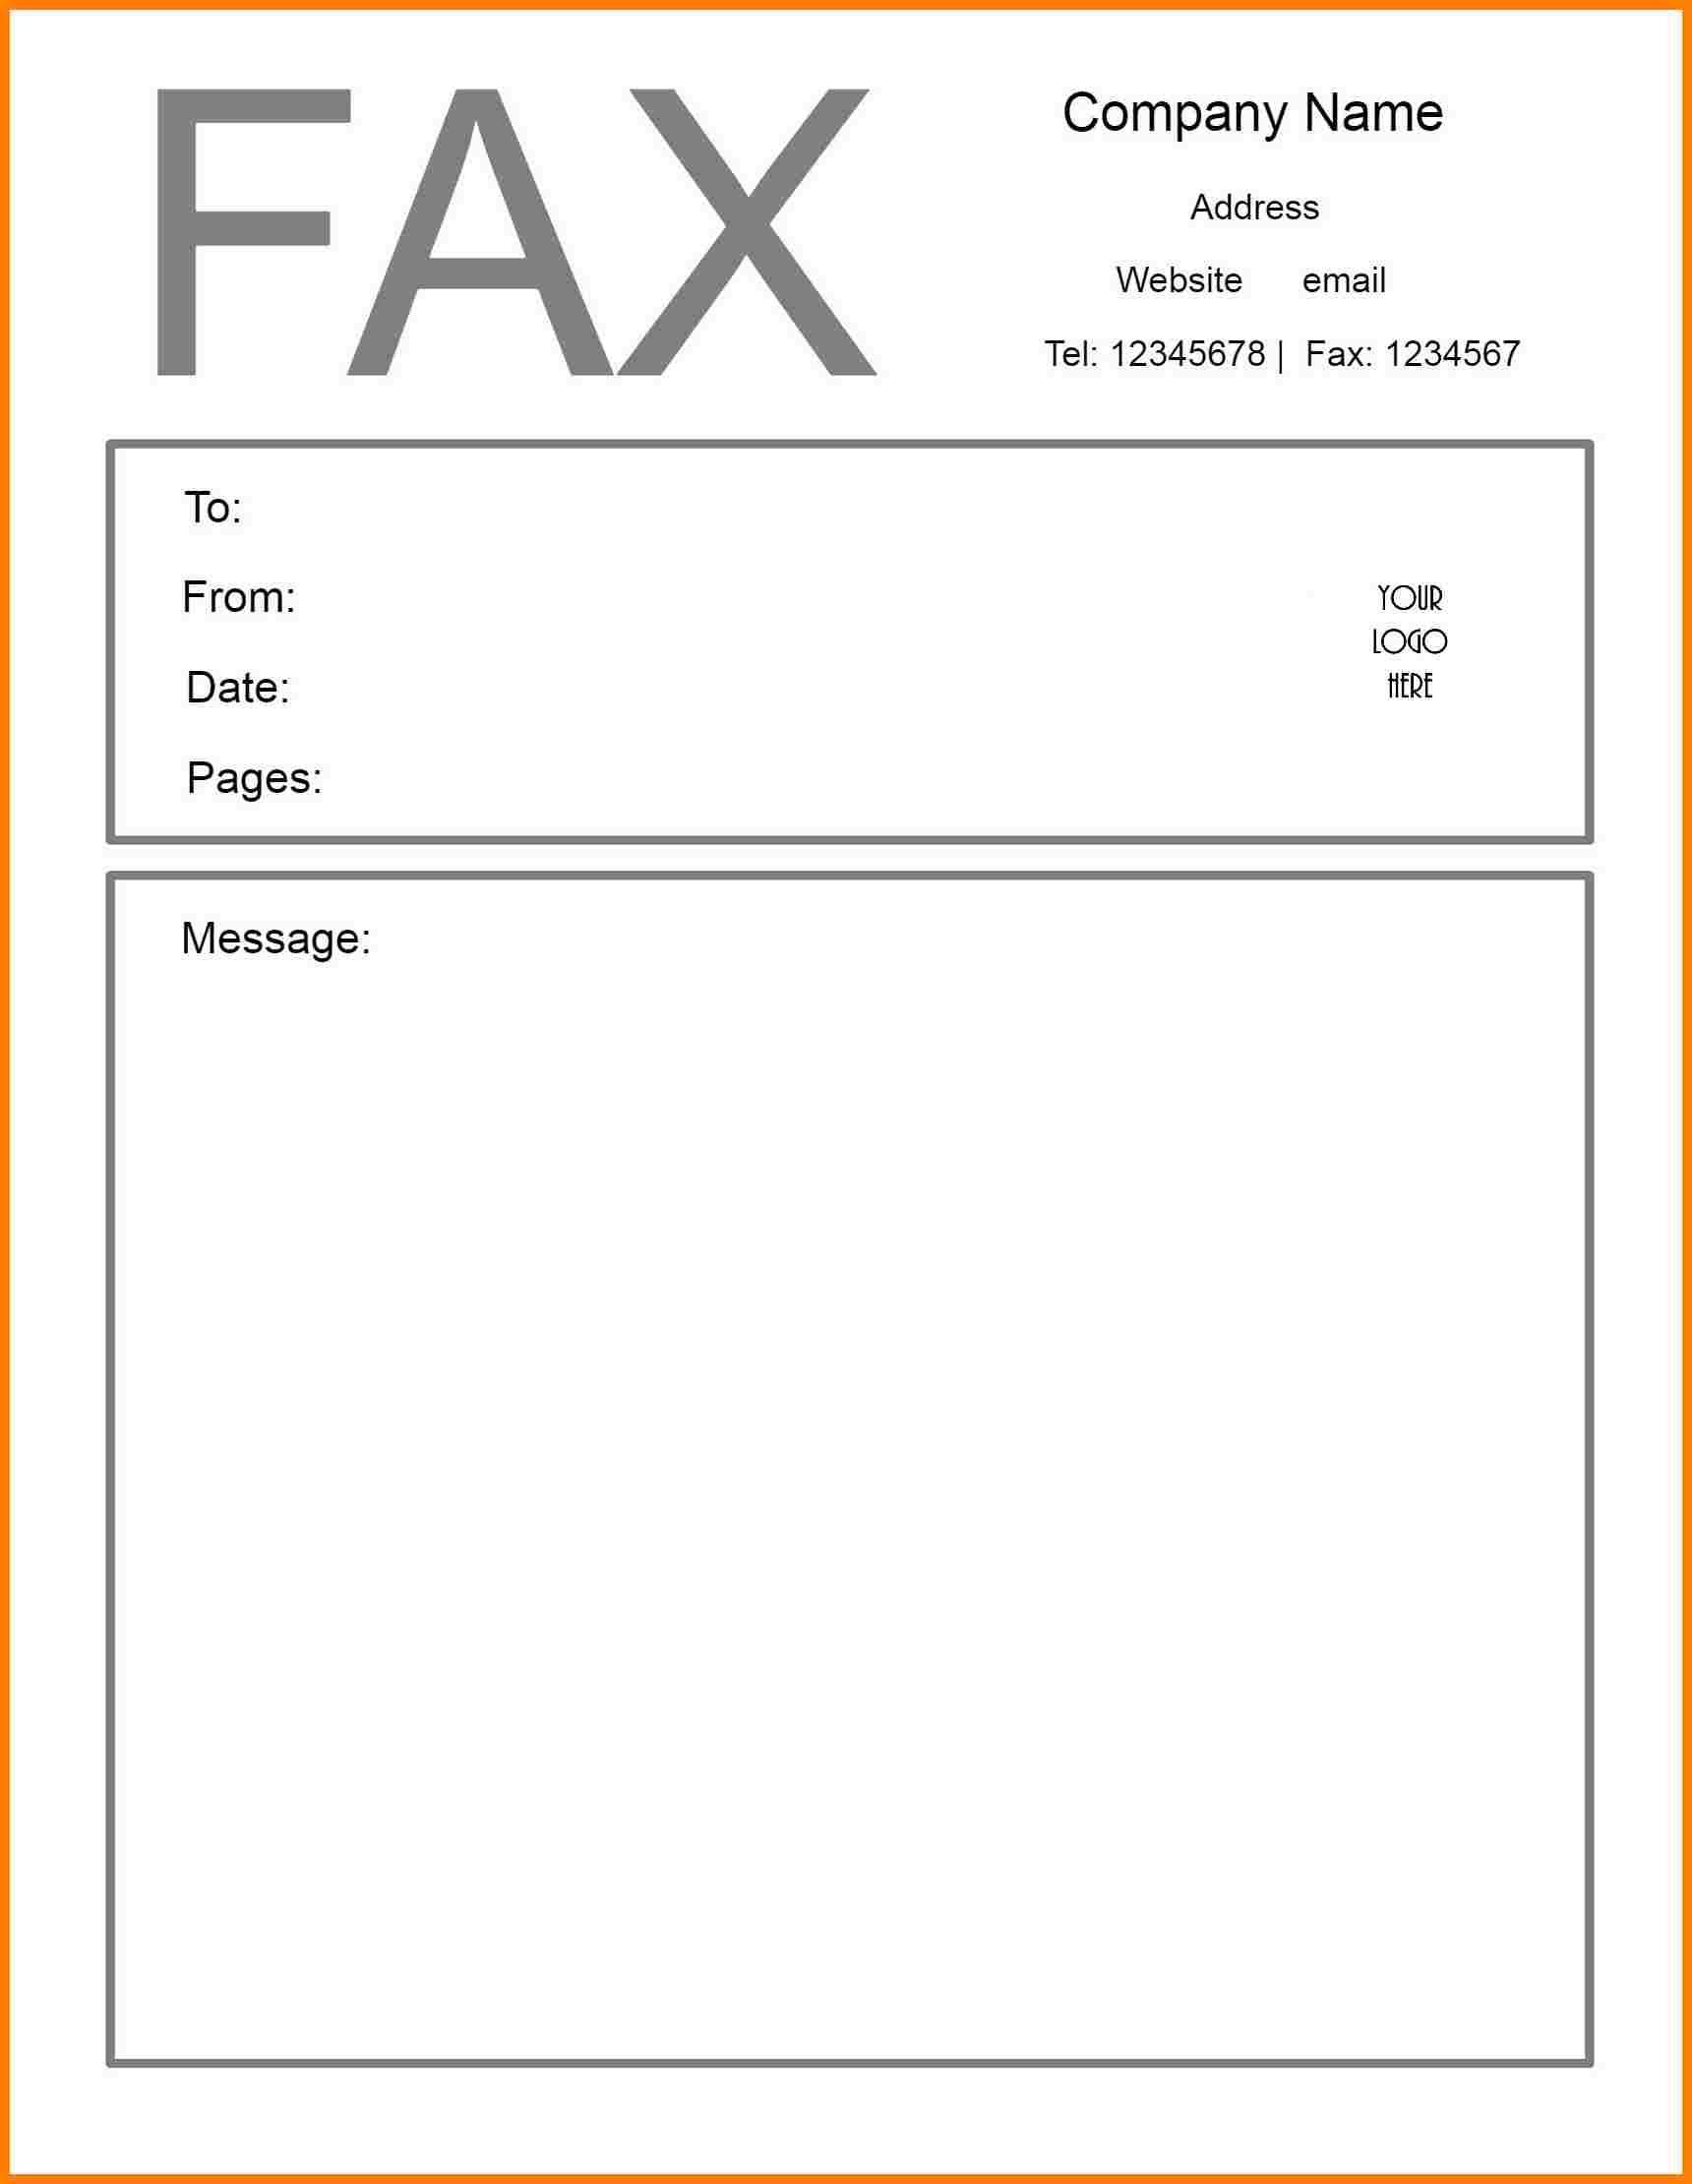 Free Printable Fax Cover Sheet | Printable Fax Cover Sheet - Free Printable Message Sheets